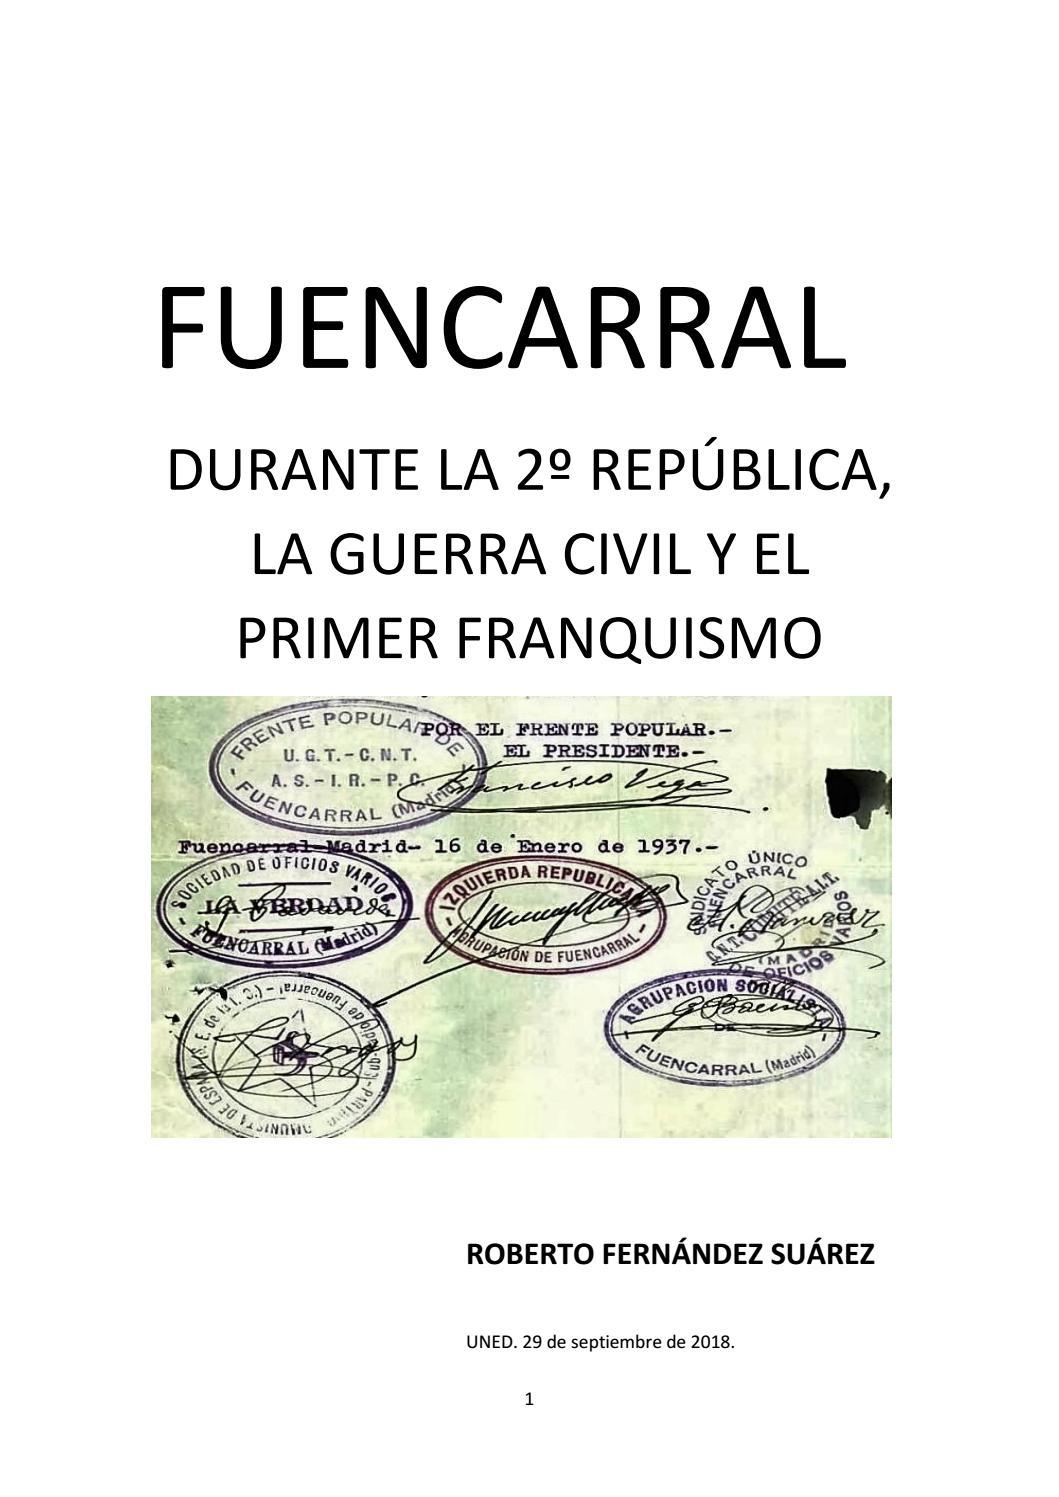 Franquismo Civil Primer La Guerra Cultura El Sierra By Y Issuu lKJ1Fc